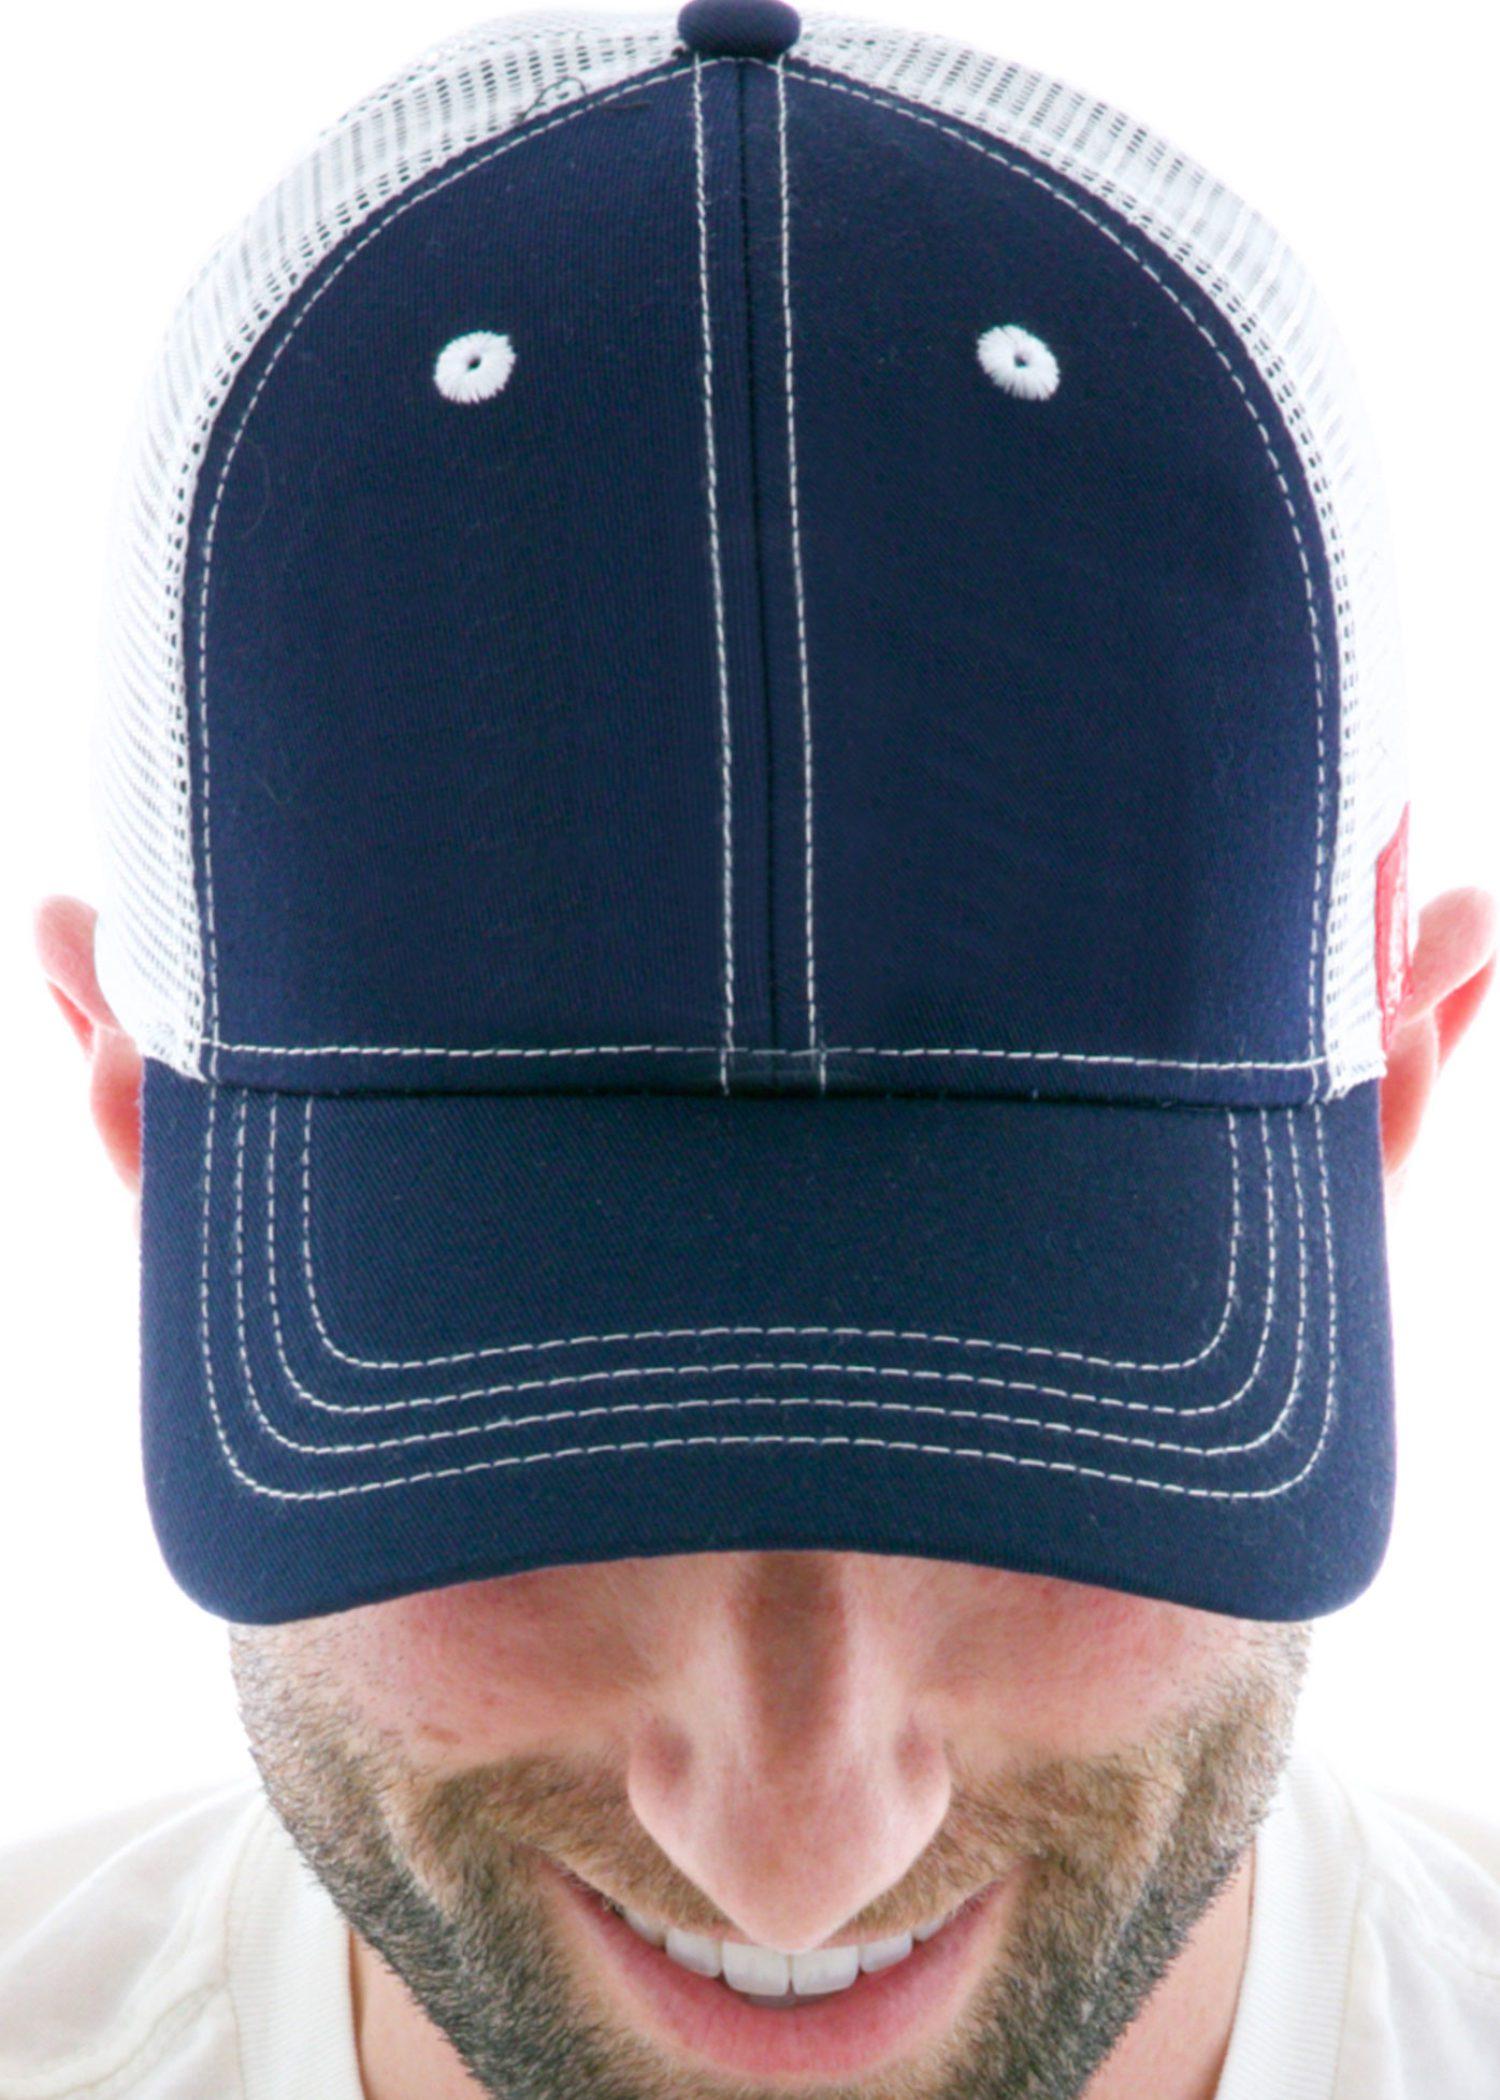 Custom Contrast Vintage Trucker Hats for Men and Women